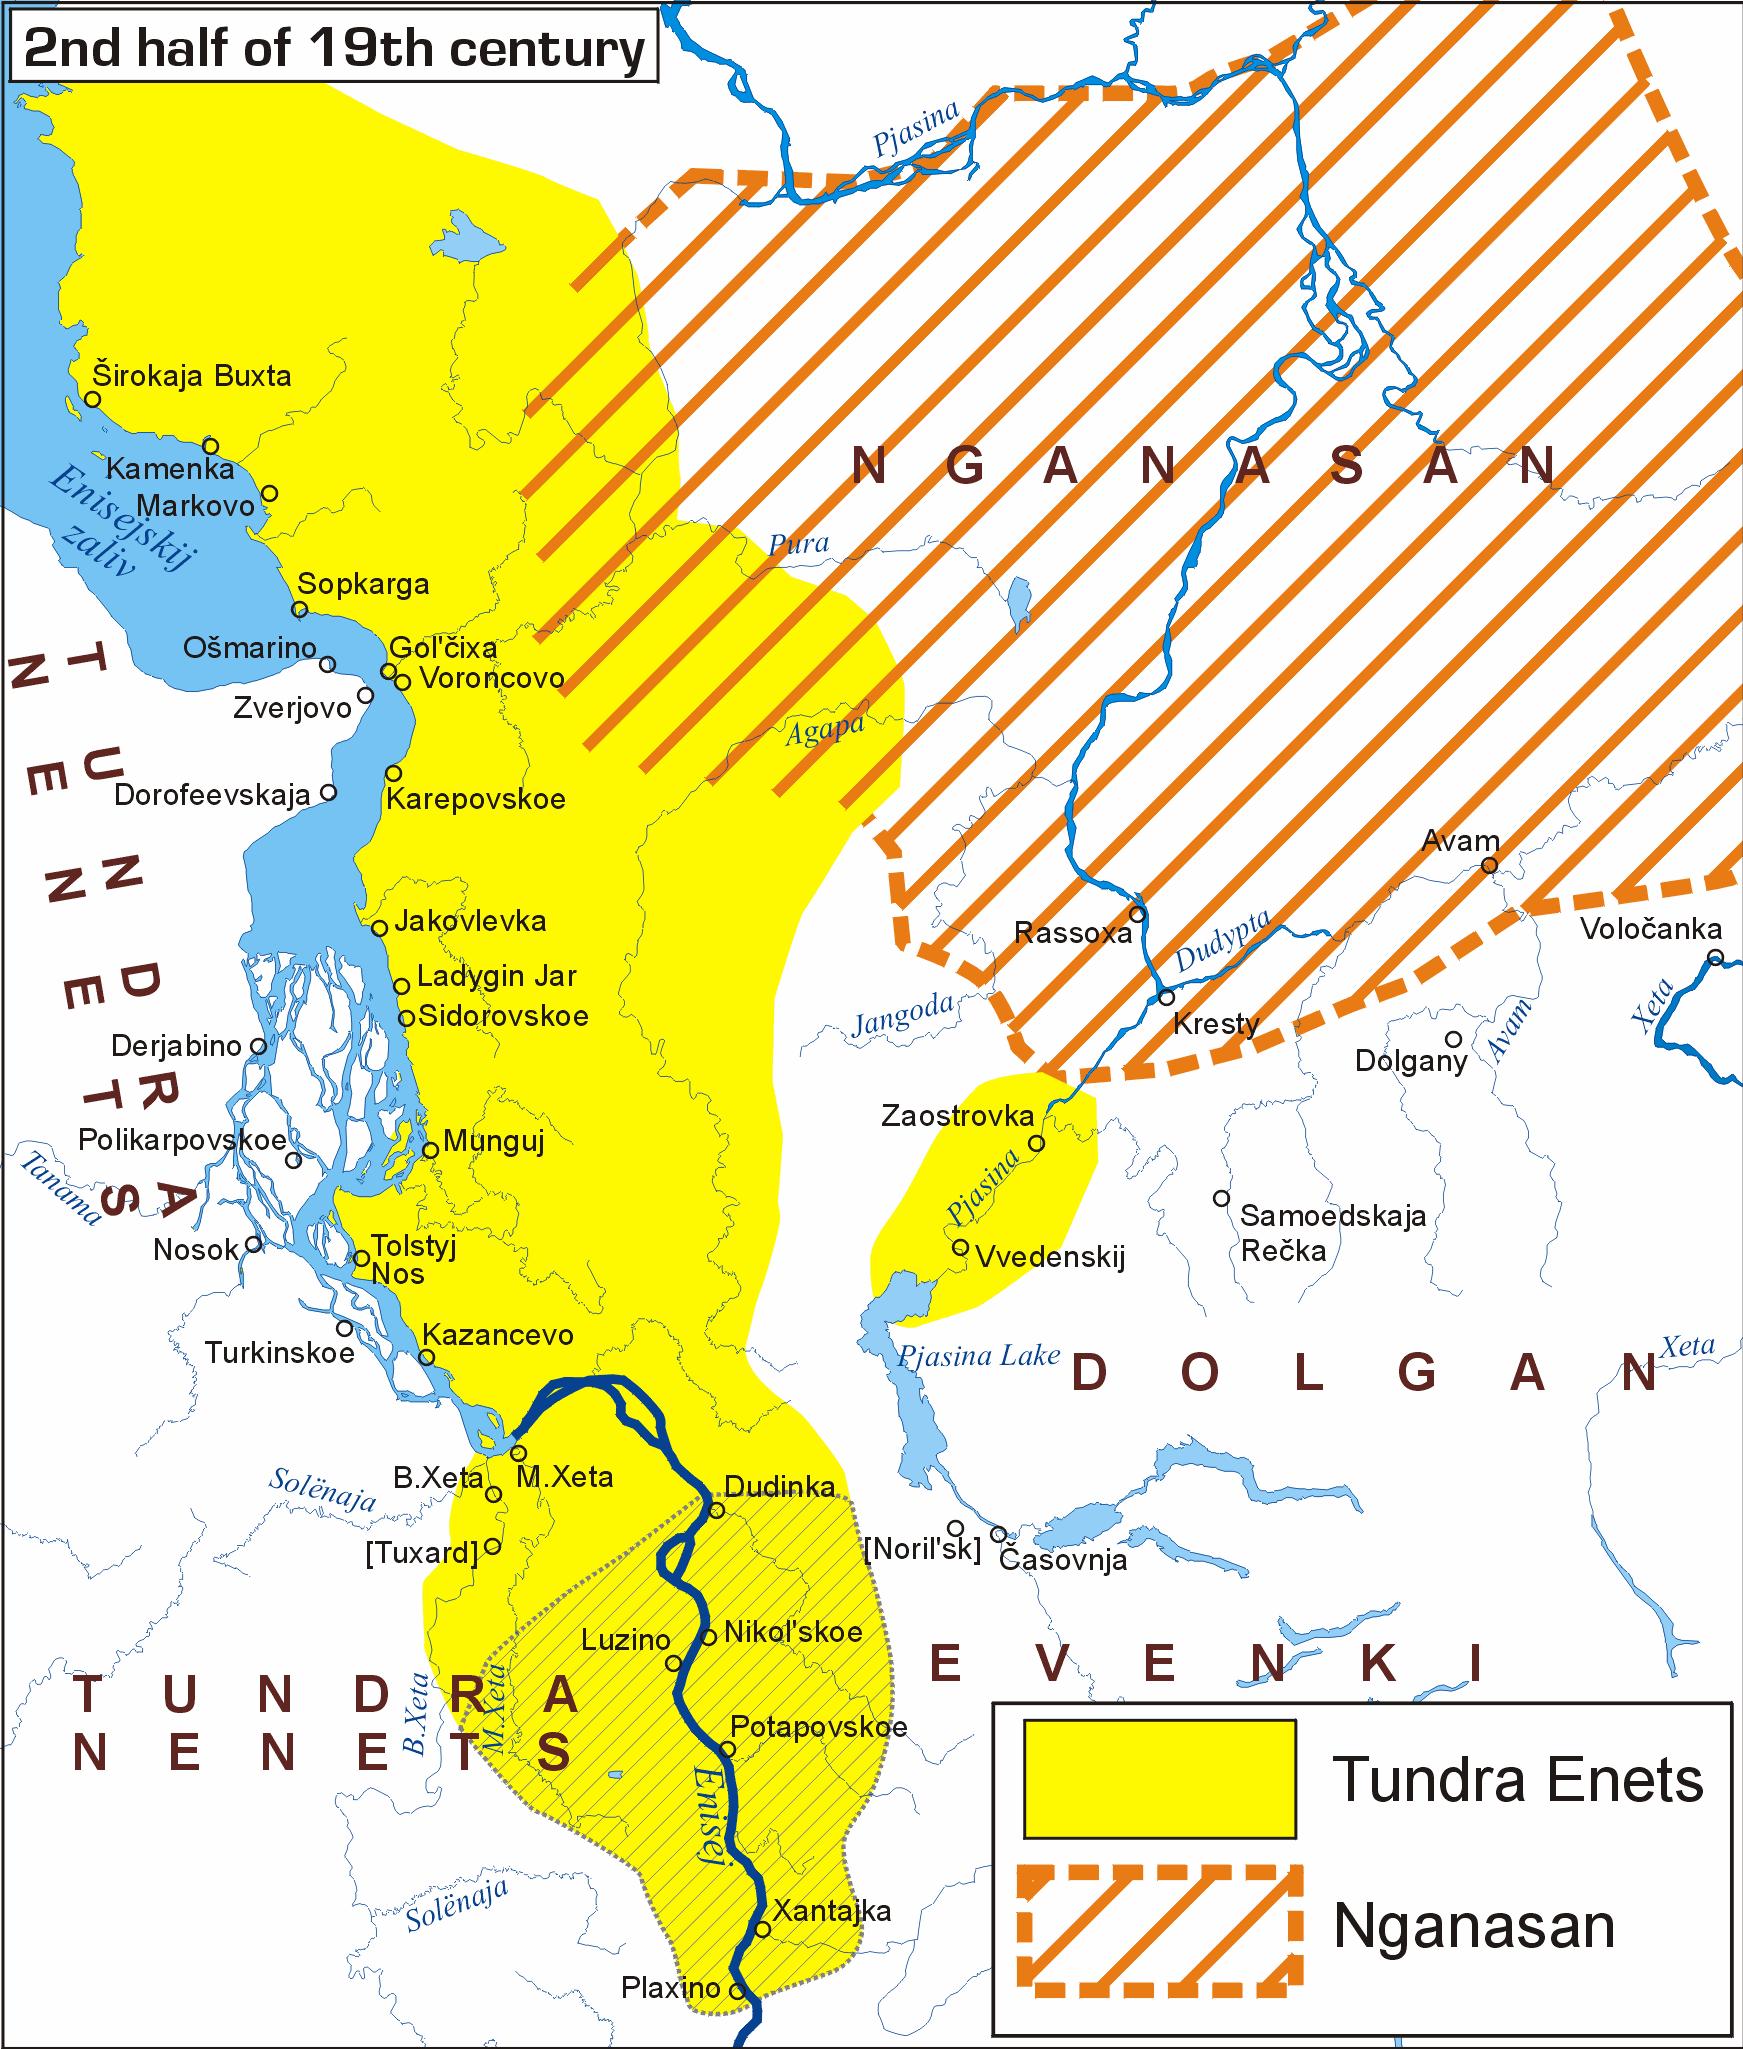 The Enets and the Nganasan languages (2nd half of 19th century); авторы Ю.Б.Коряков, О.В.Ханина